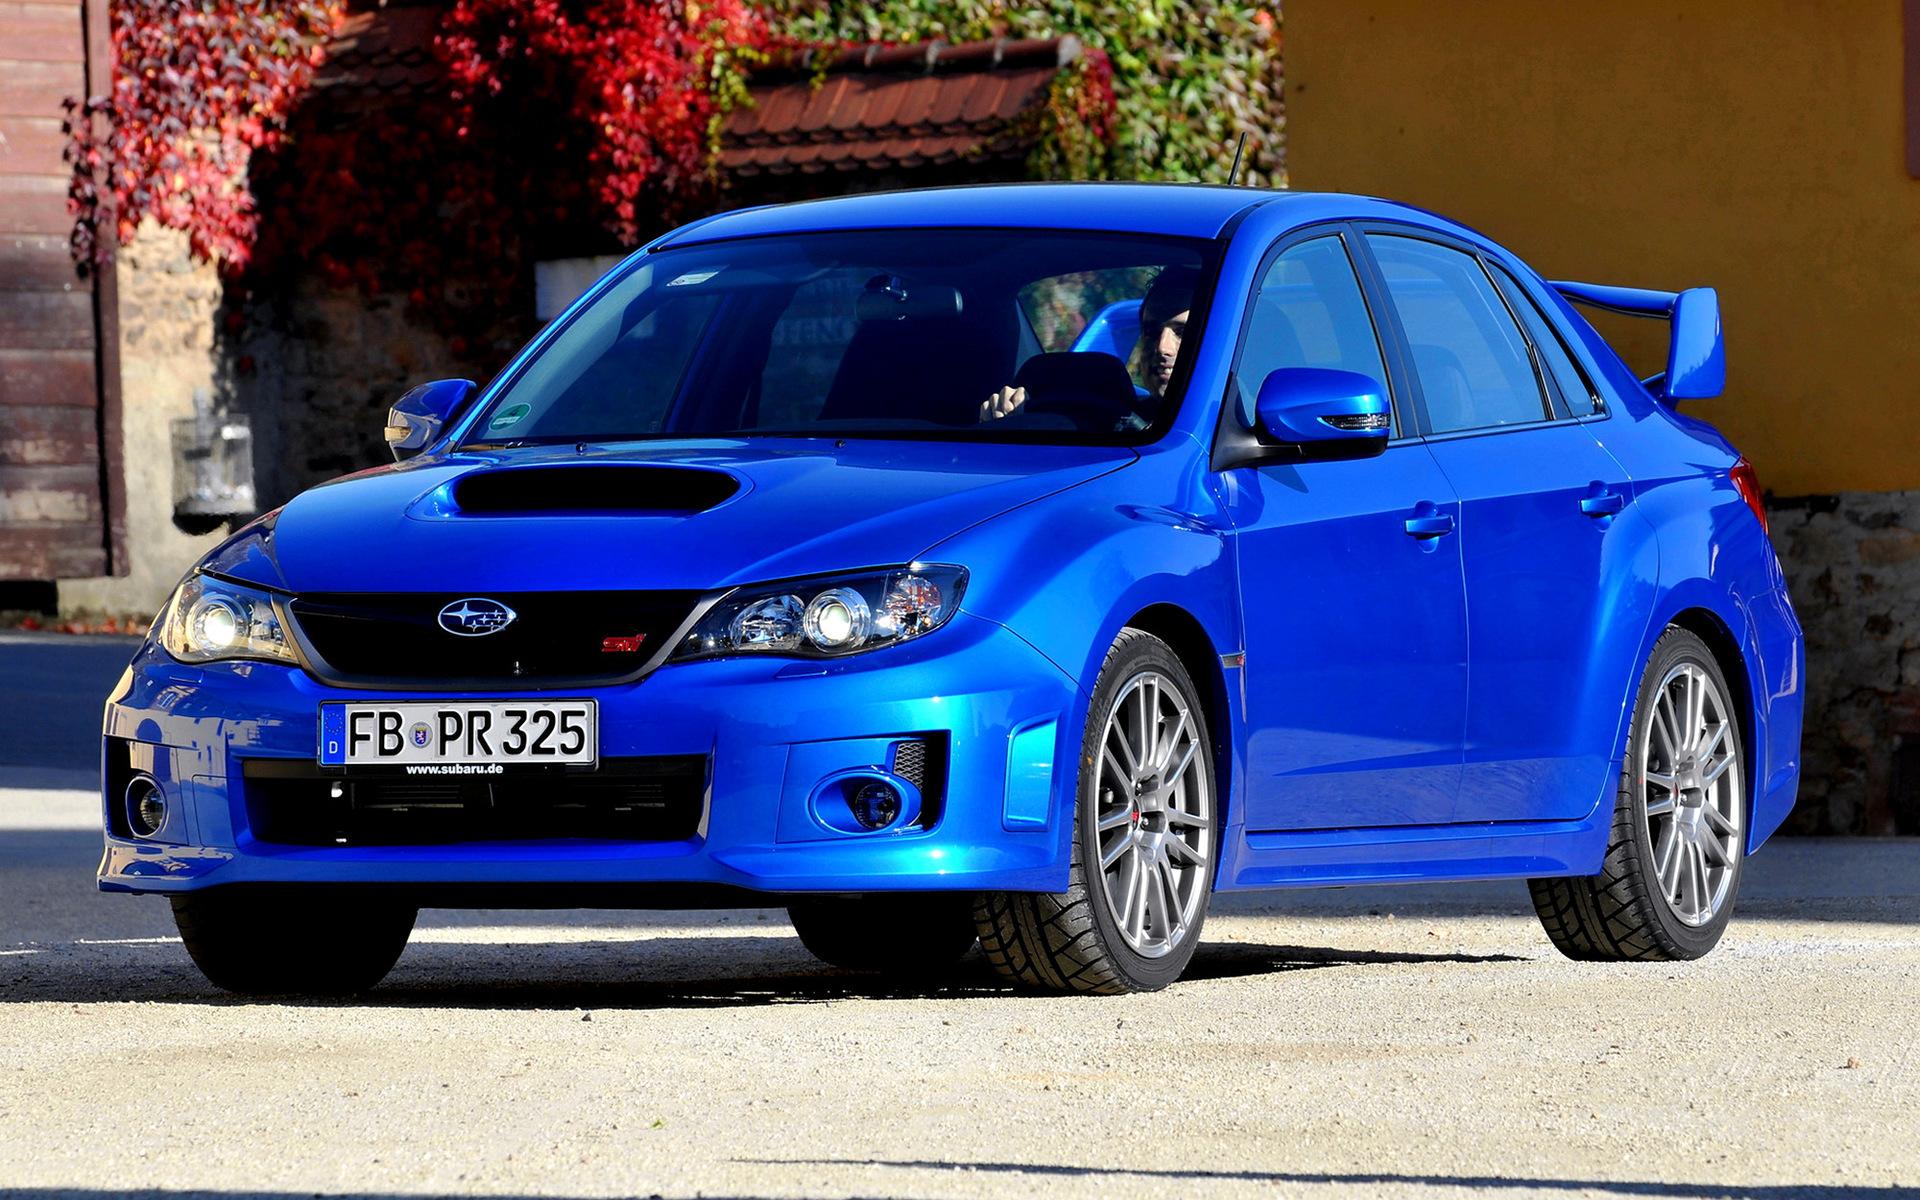 2010 Subaru Impreza Wrx Sti Sedan Wallpapers And Hd